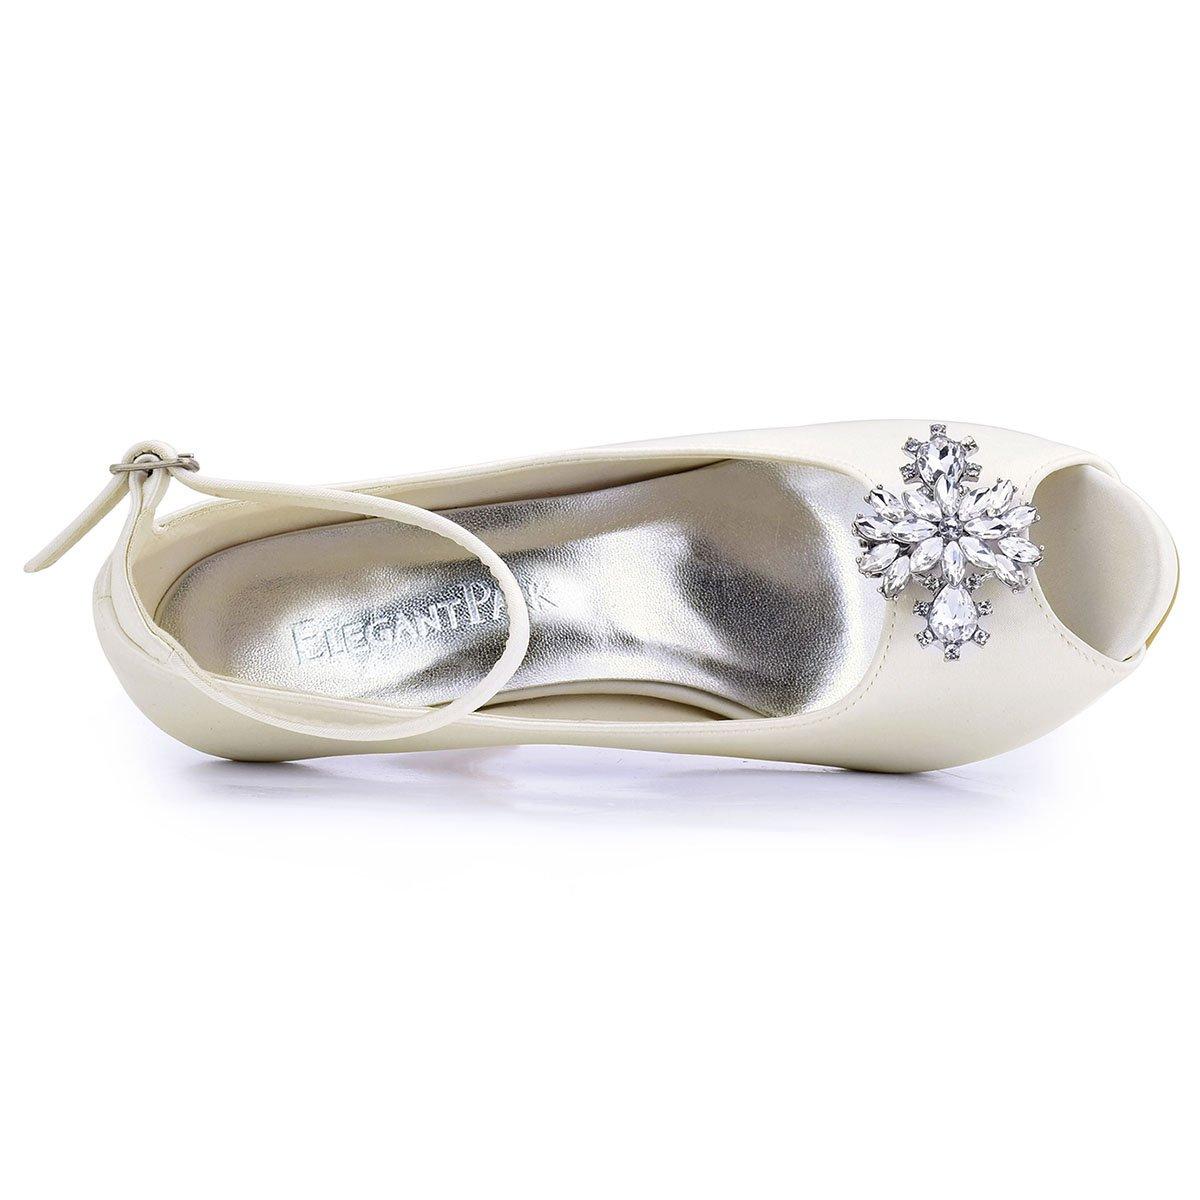 ElegantPark AK Wedding Dress Clutch Double Rhinestones Flowers Silver Shoe Clips 2 Pcs by ElegantPark (Image #4)